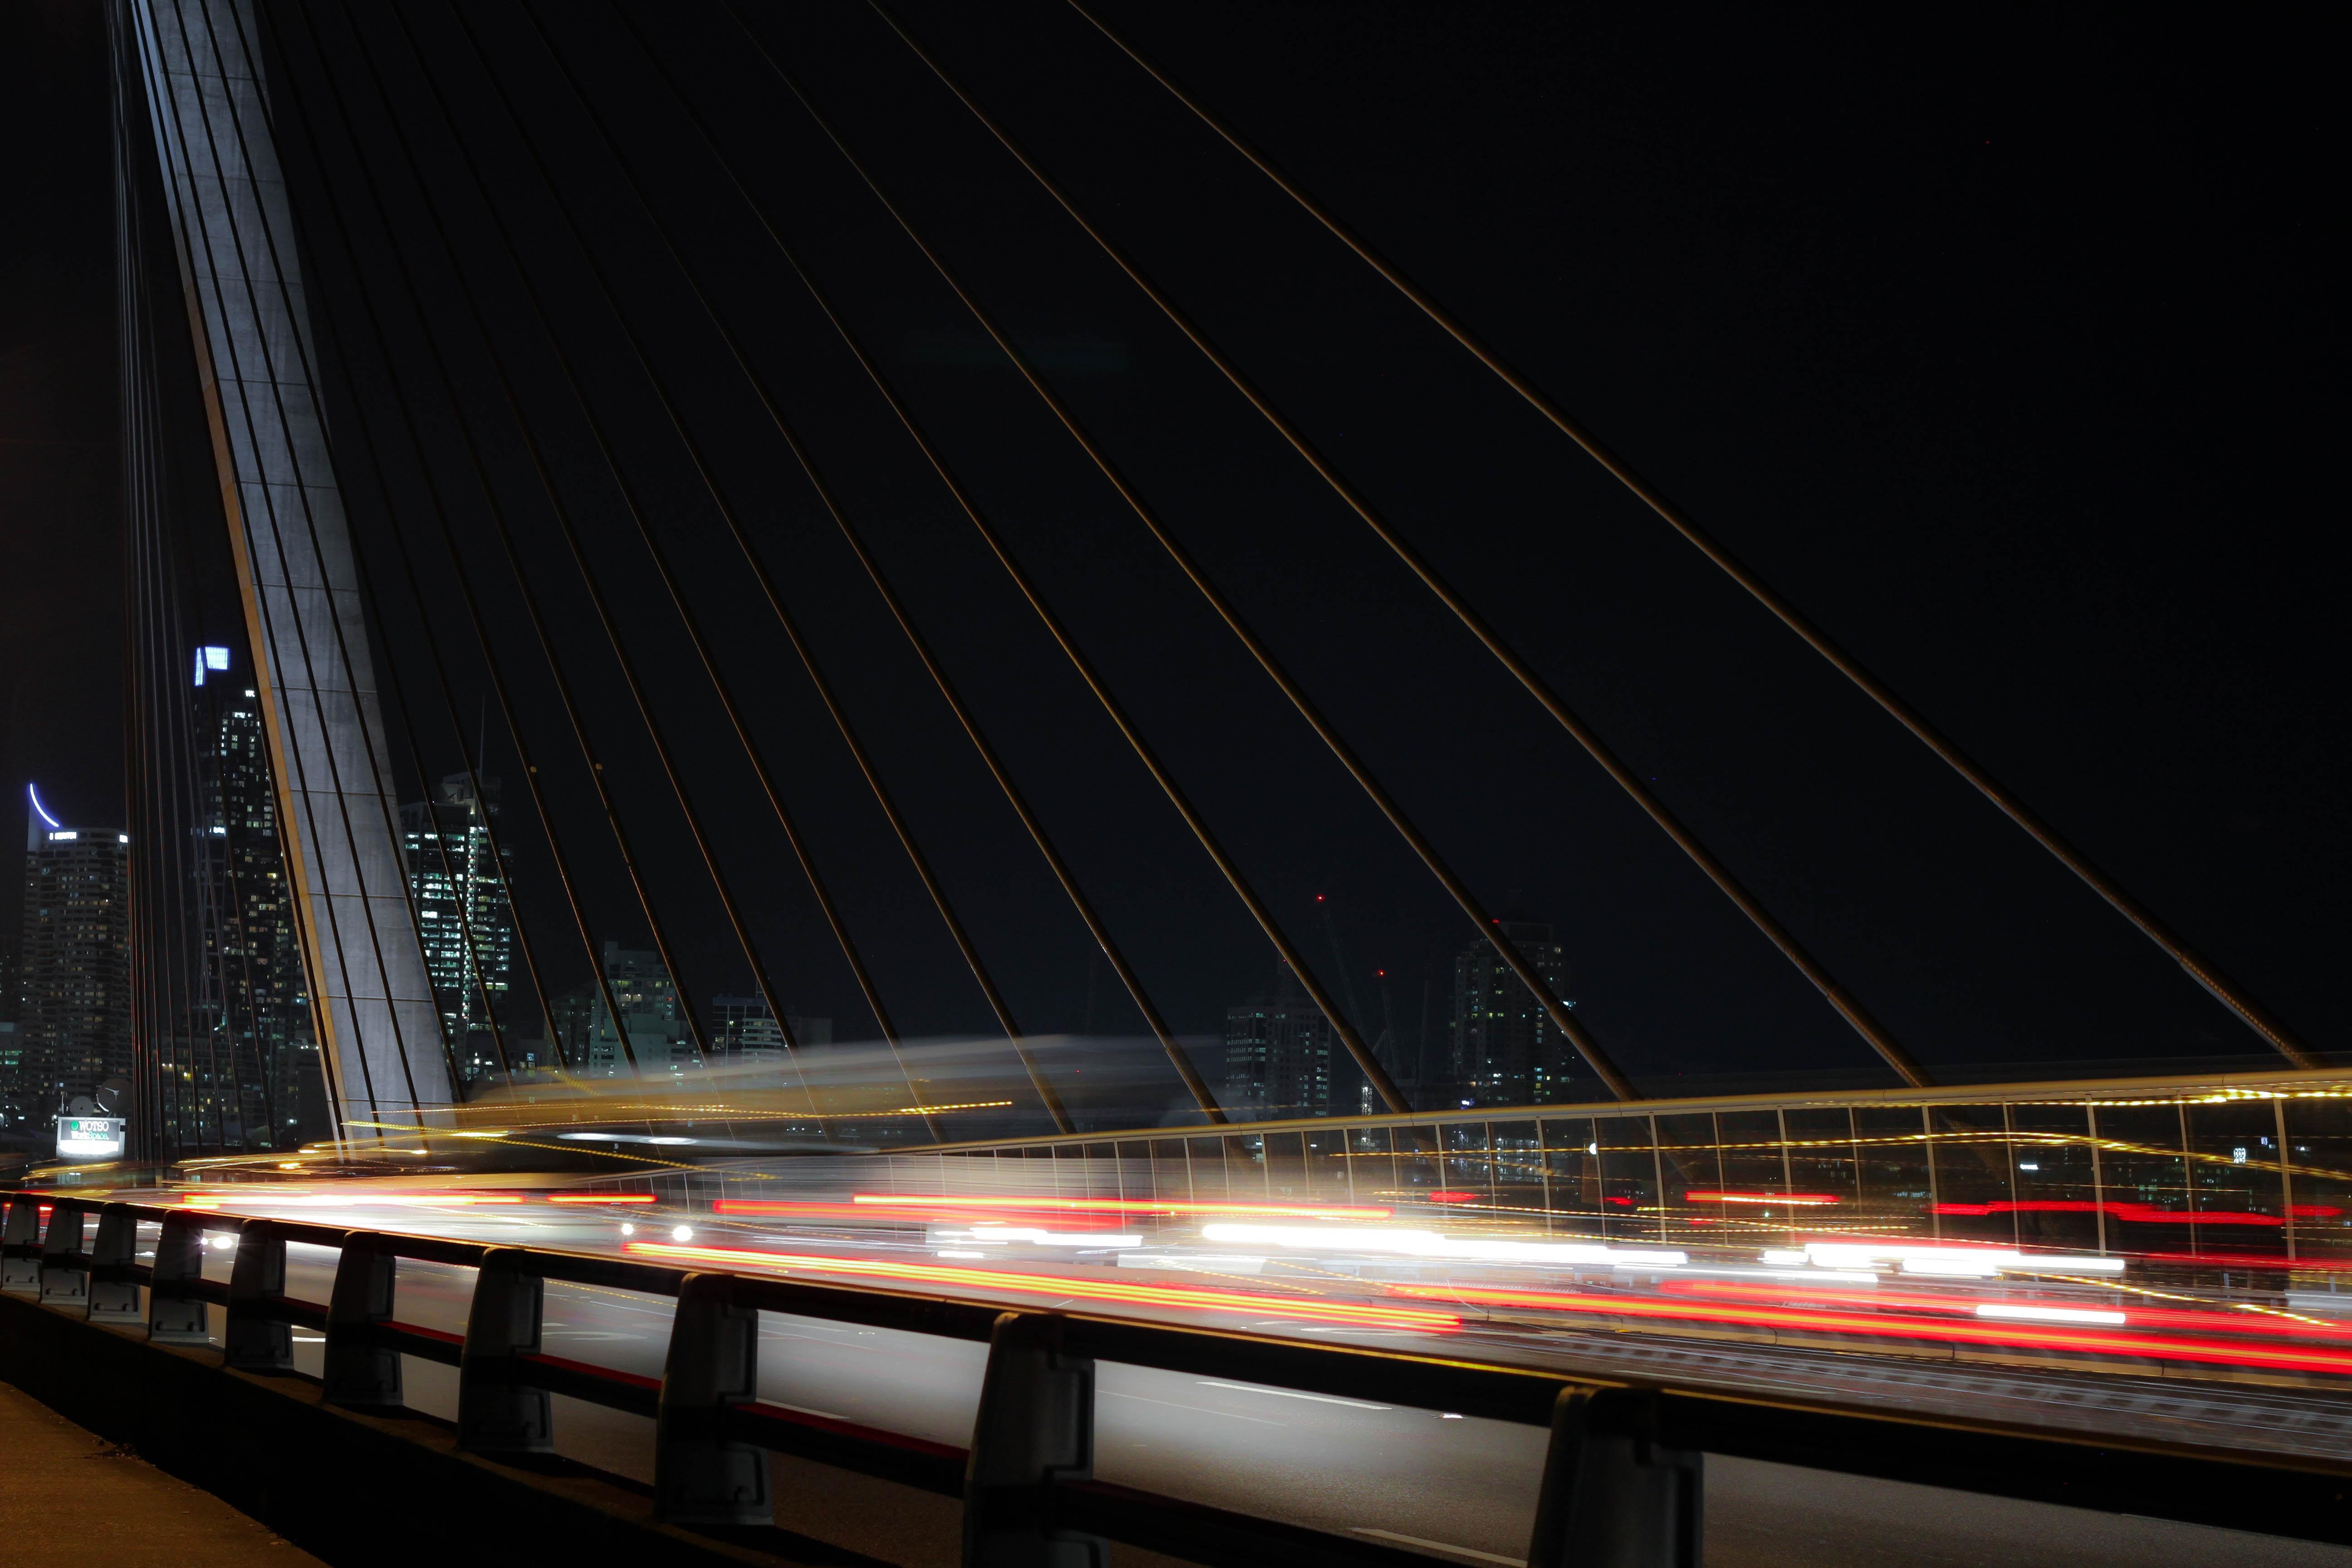 A dark and blurry shot of traffic light trails on a tension bridge in Sydney